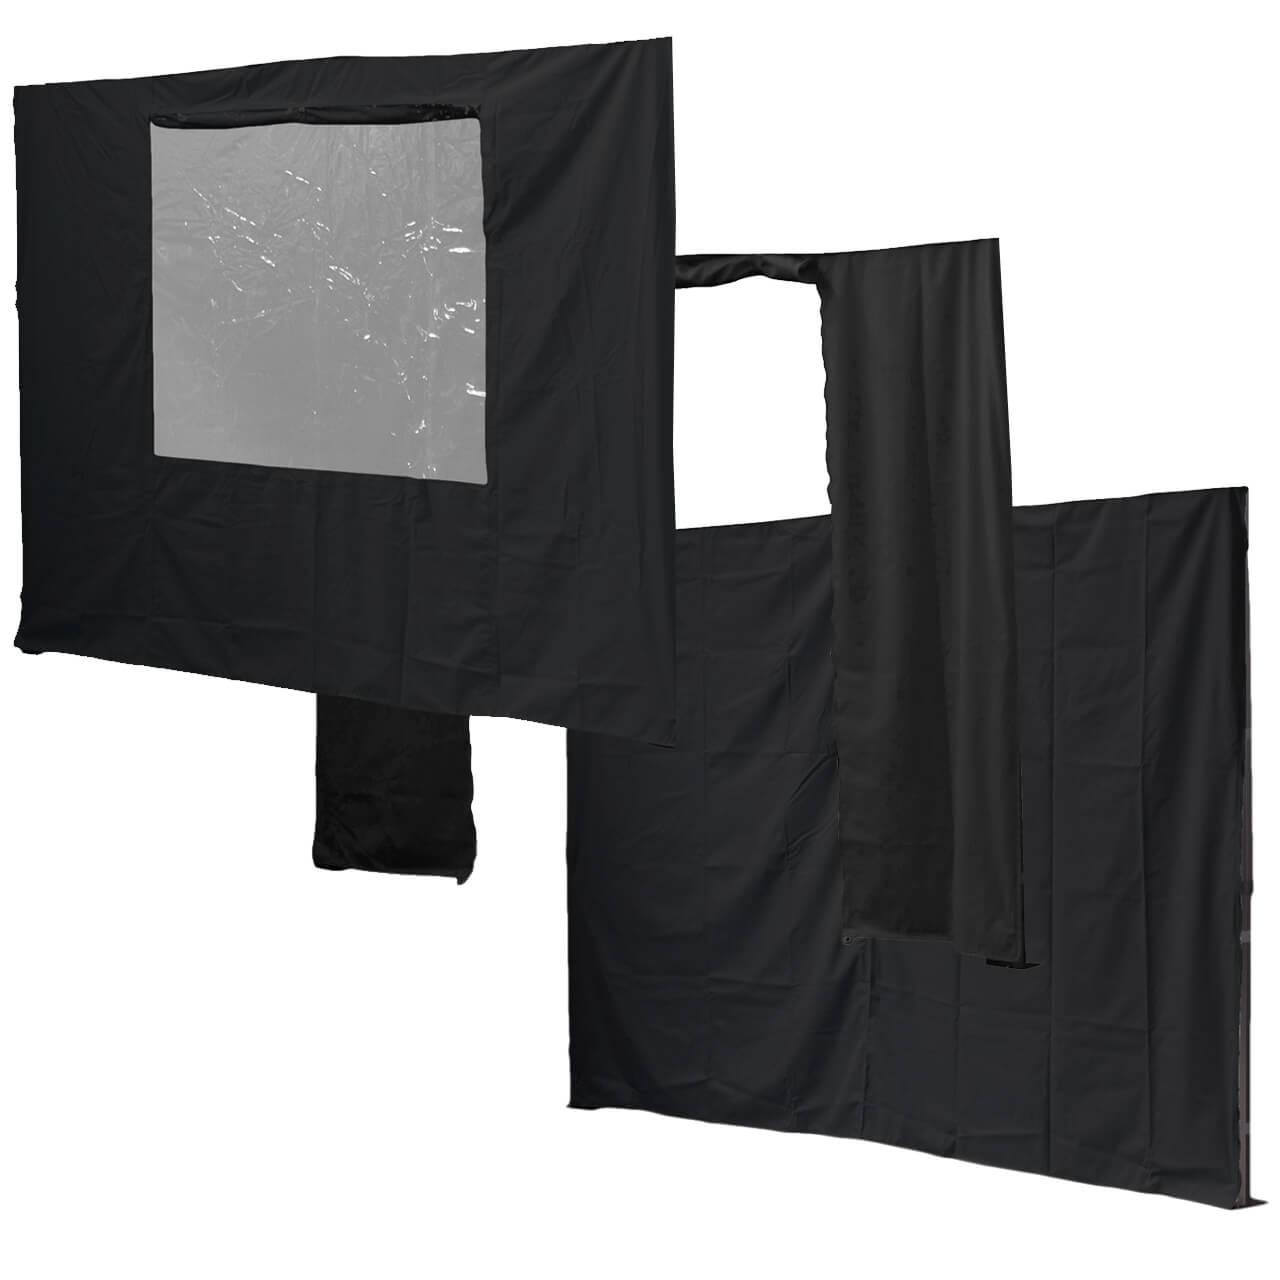 Faltpavillon-Seitenwaende-schwarz